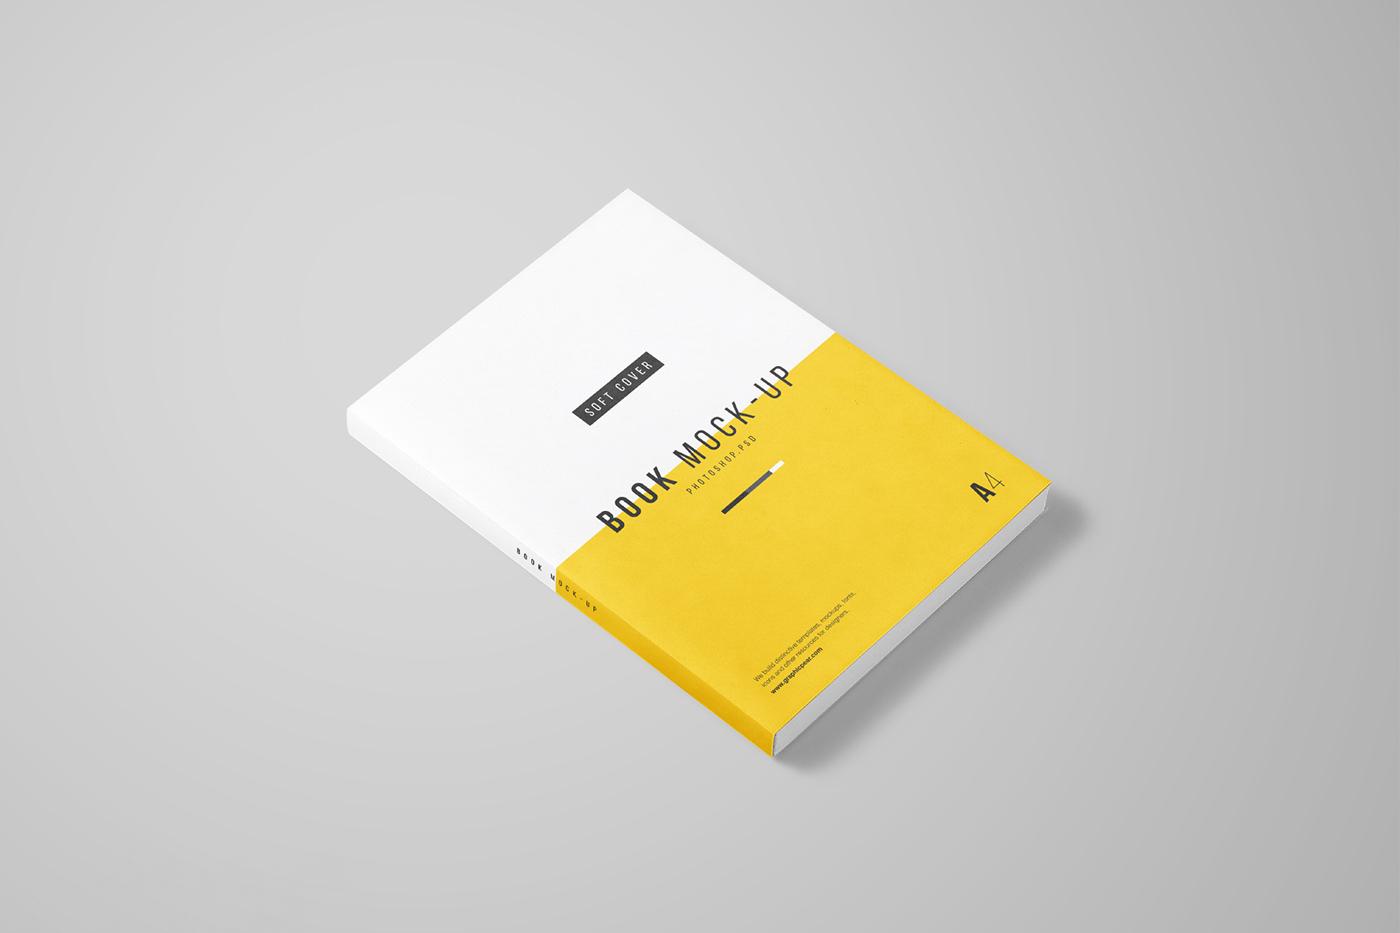 A4 Book Mockup - FREE PSD